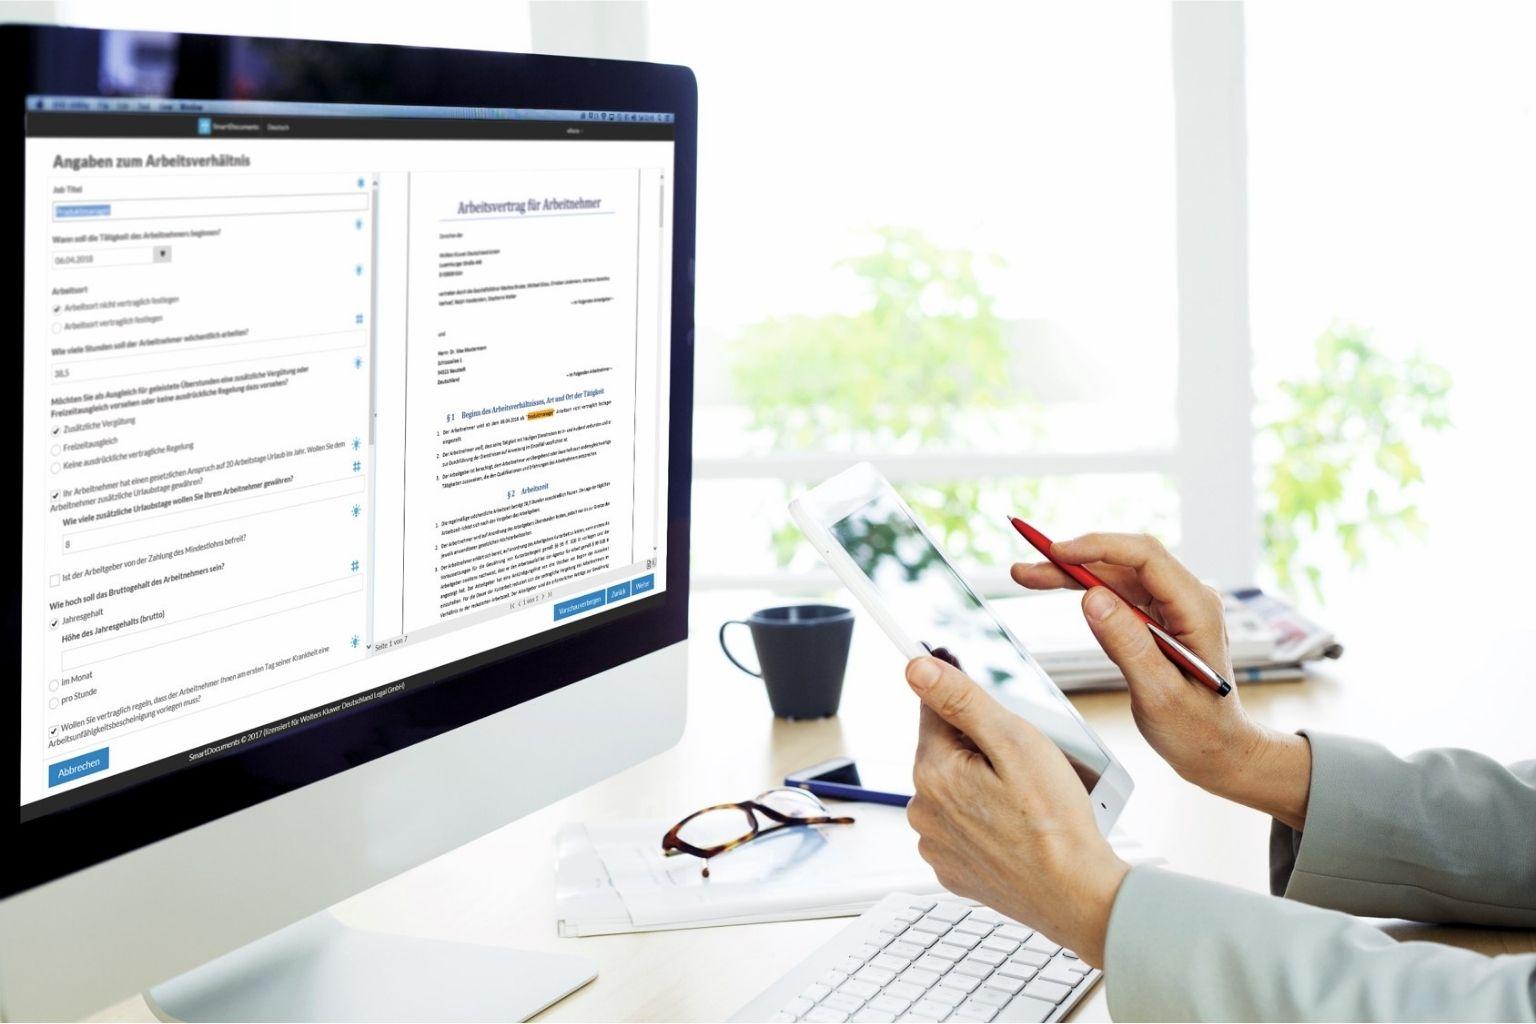 Legal-SmartDocuments-Benefit1-2x